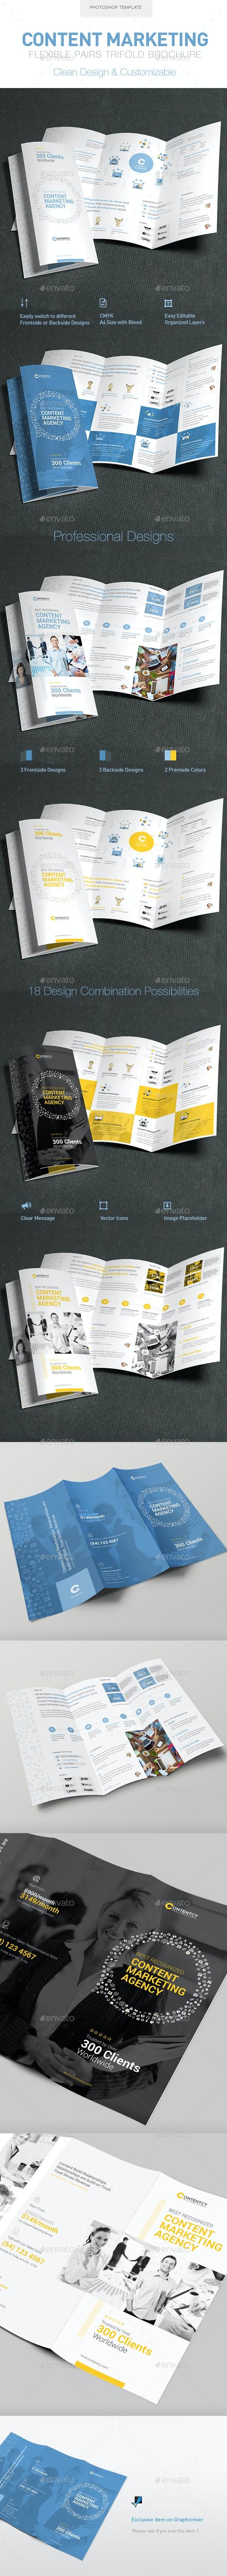 Content Marketing Trifold Brochure - Brochures Print Templates